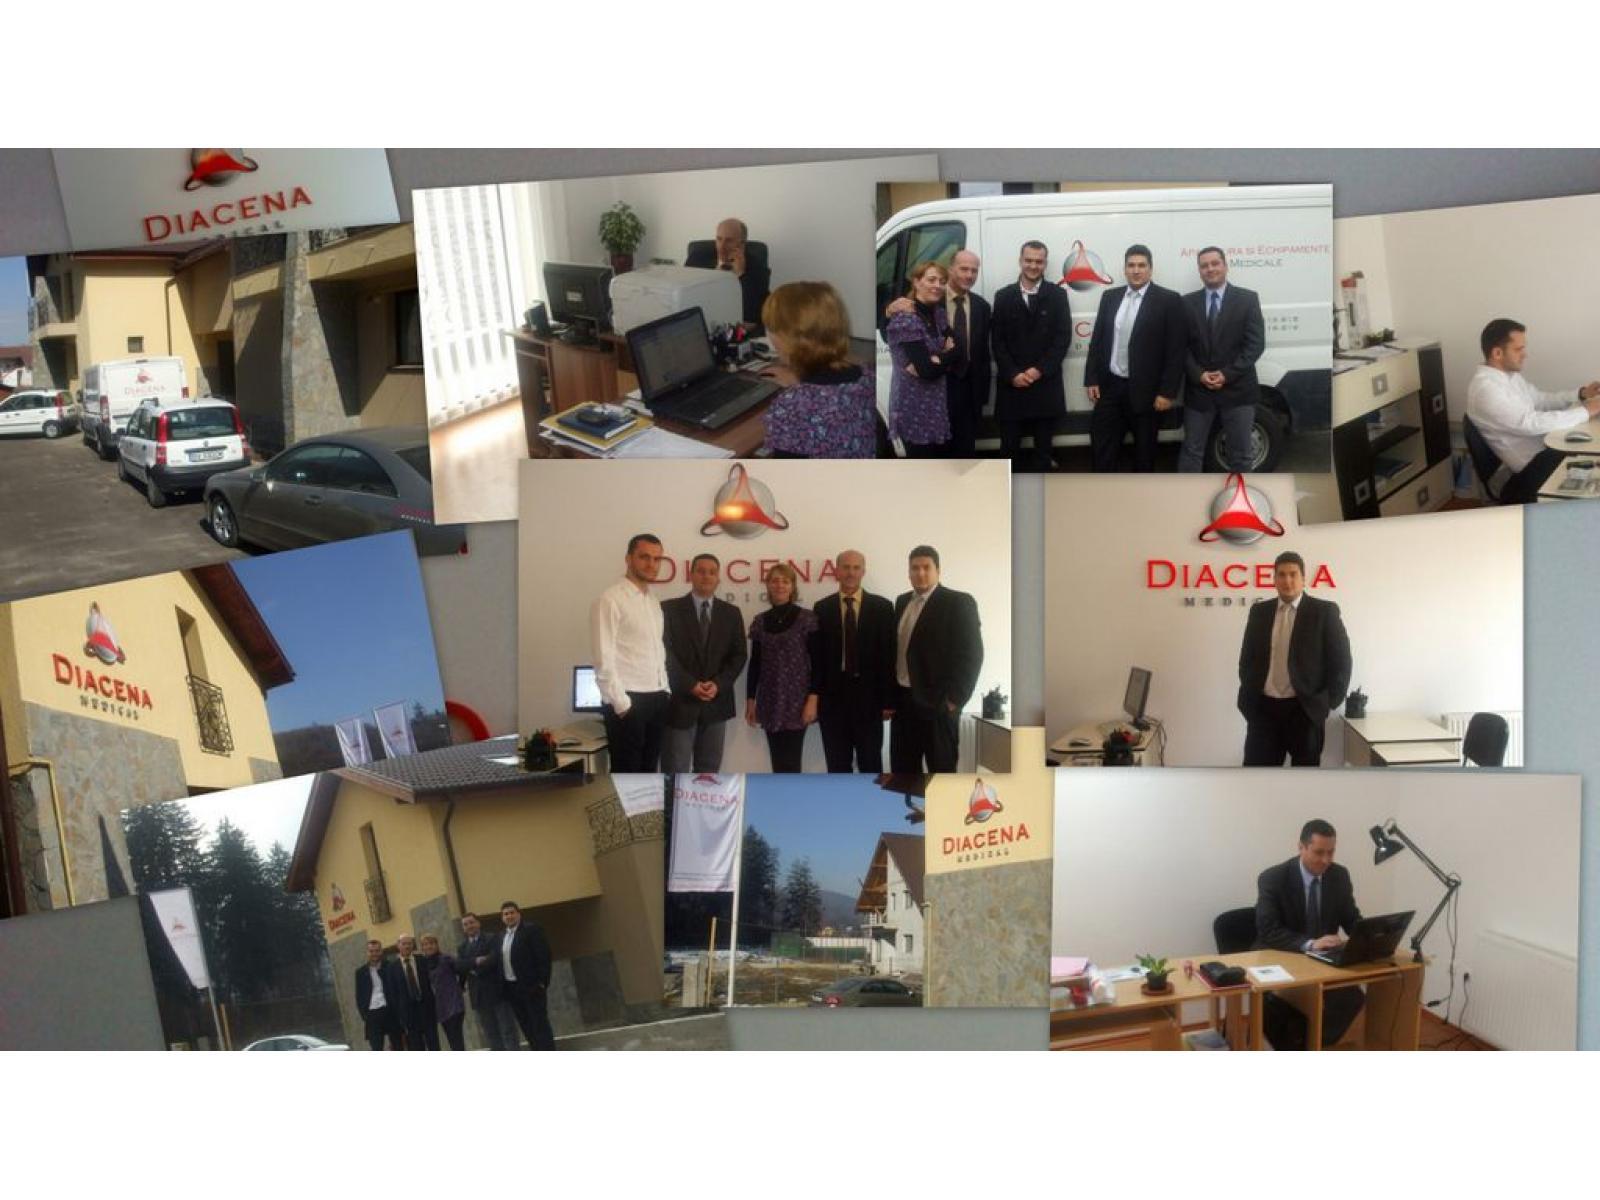 Diacena Medical - diacena-medical1.jpg